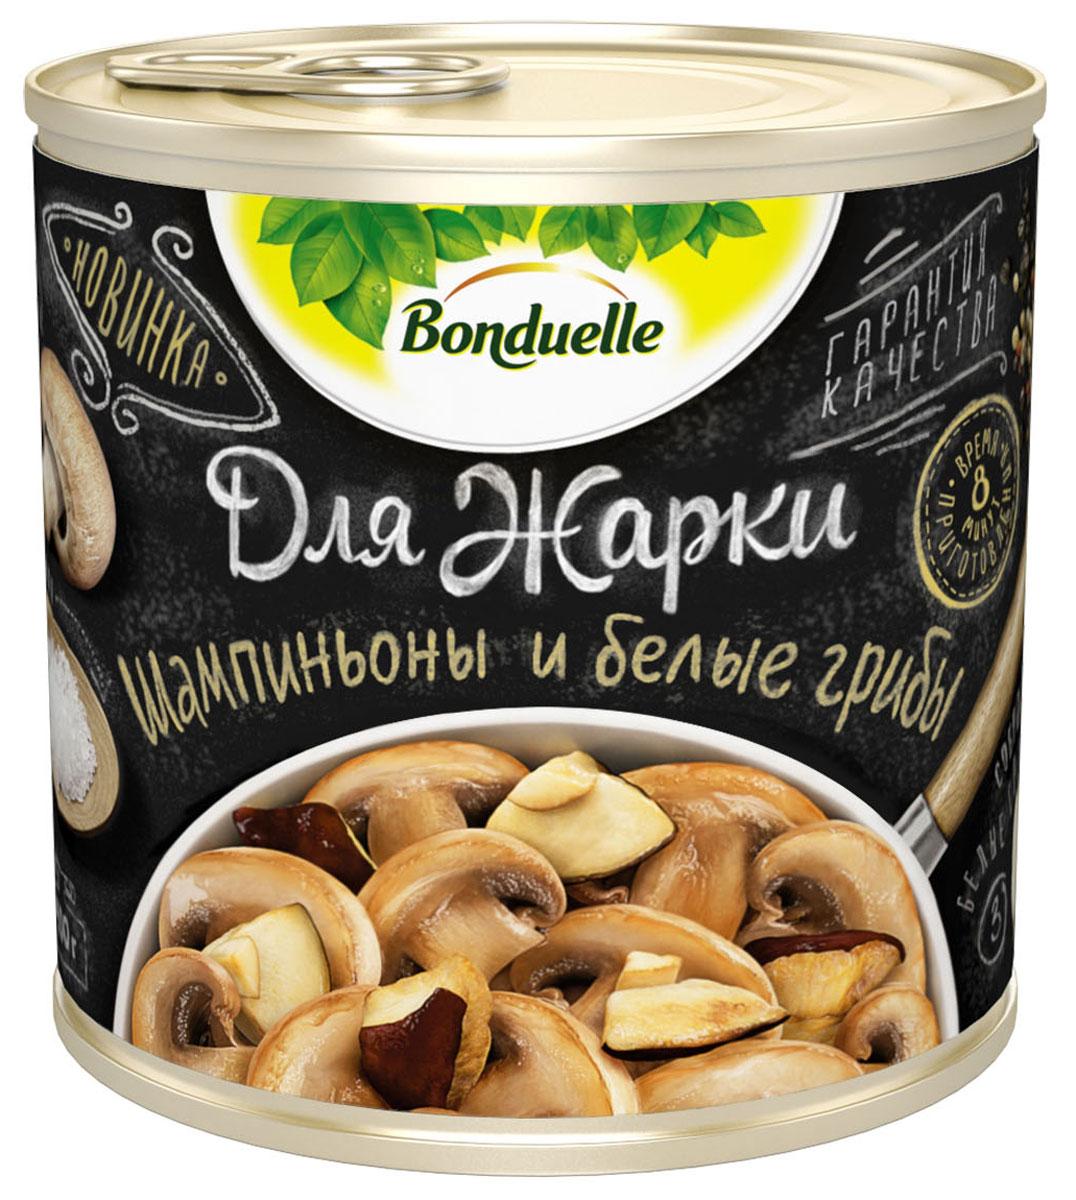 Bonduelle шампиньоны и белые грибы Для жарки, 400 г грибы vitaland виталанд шампиньоны резаные 425г ж б